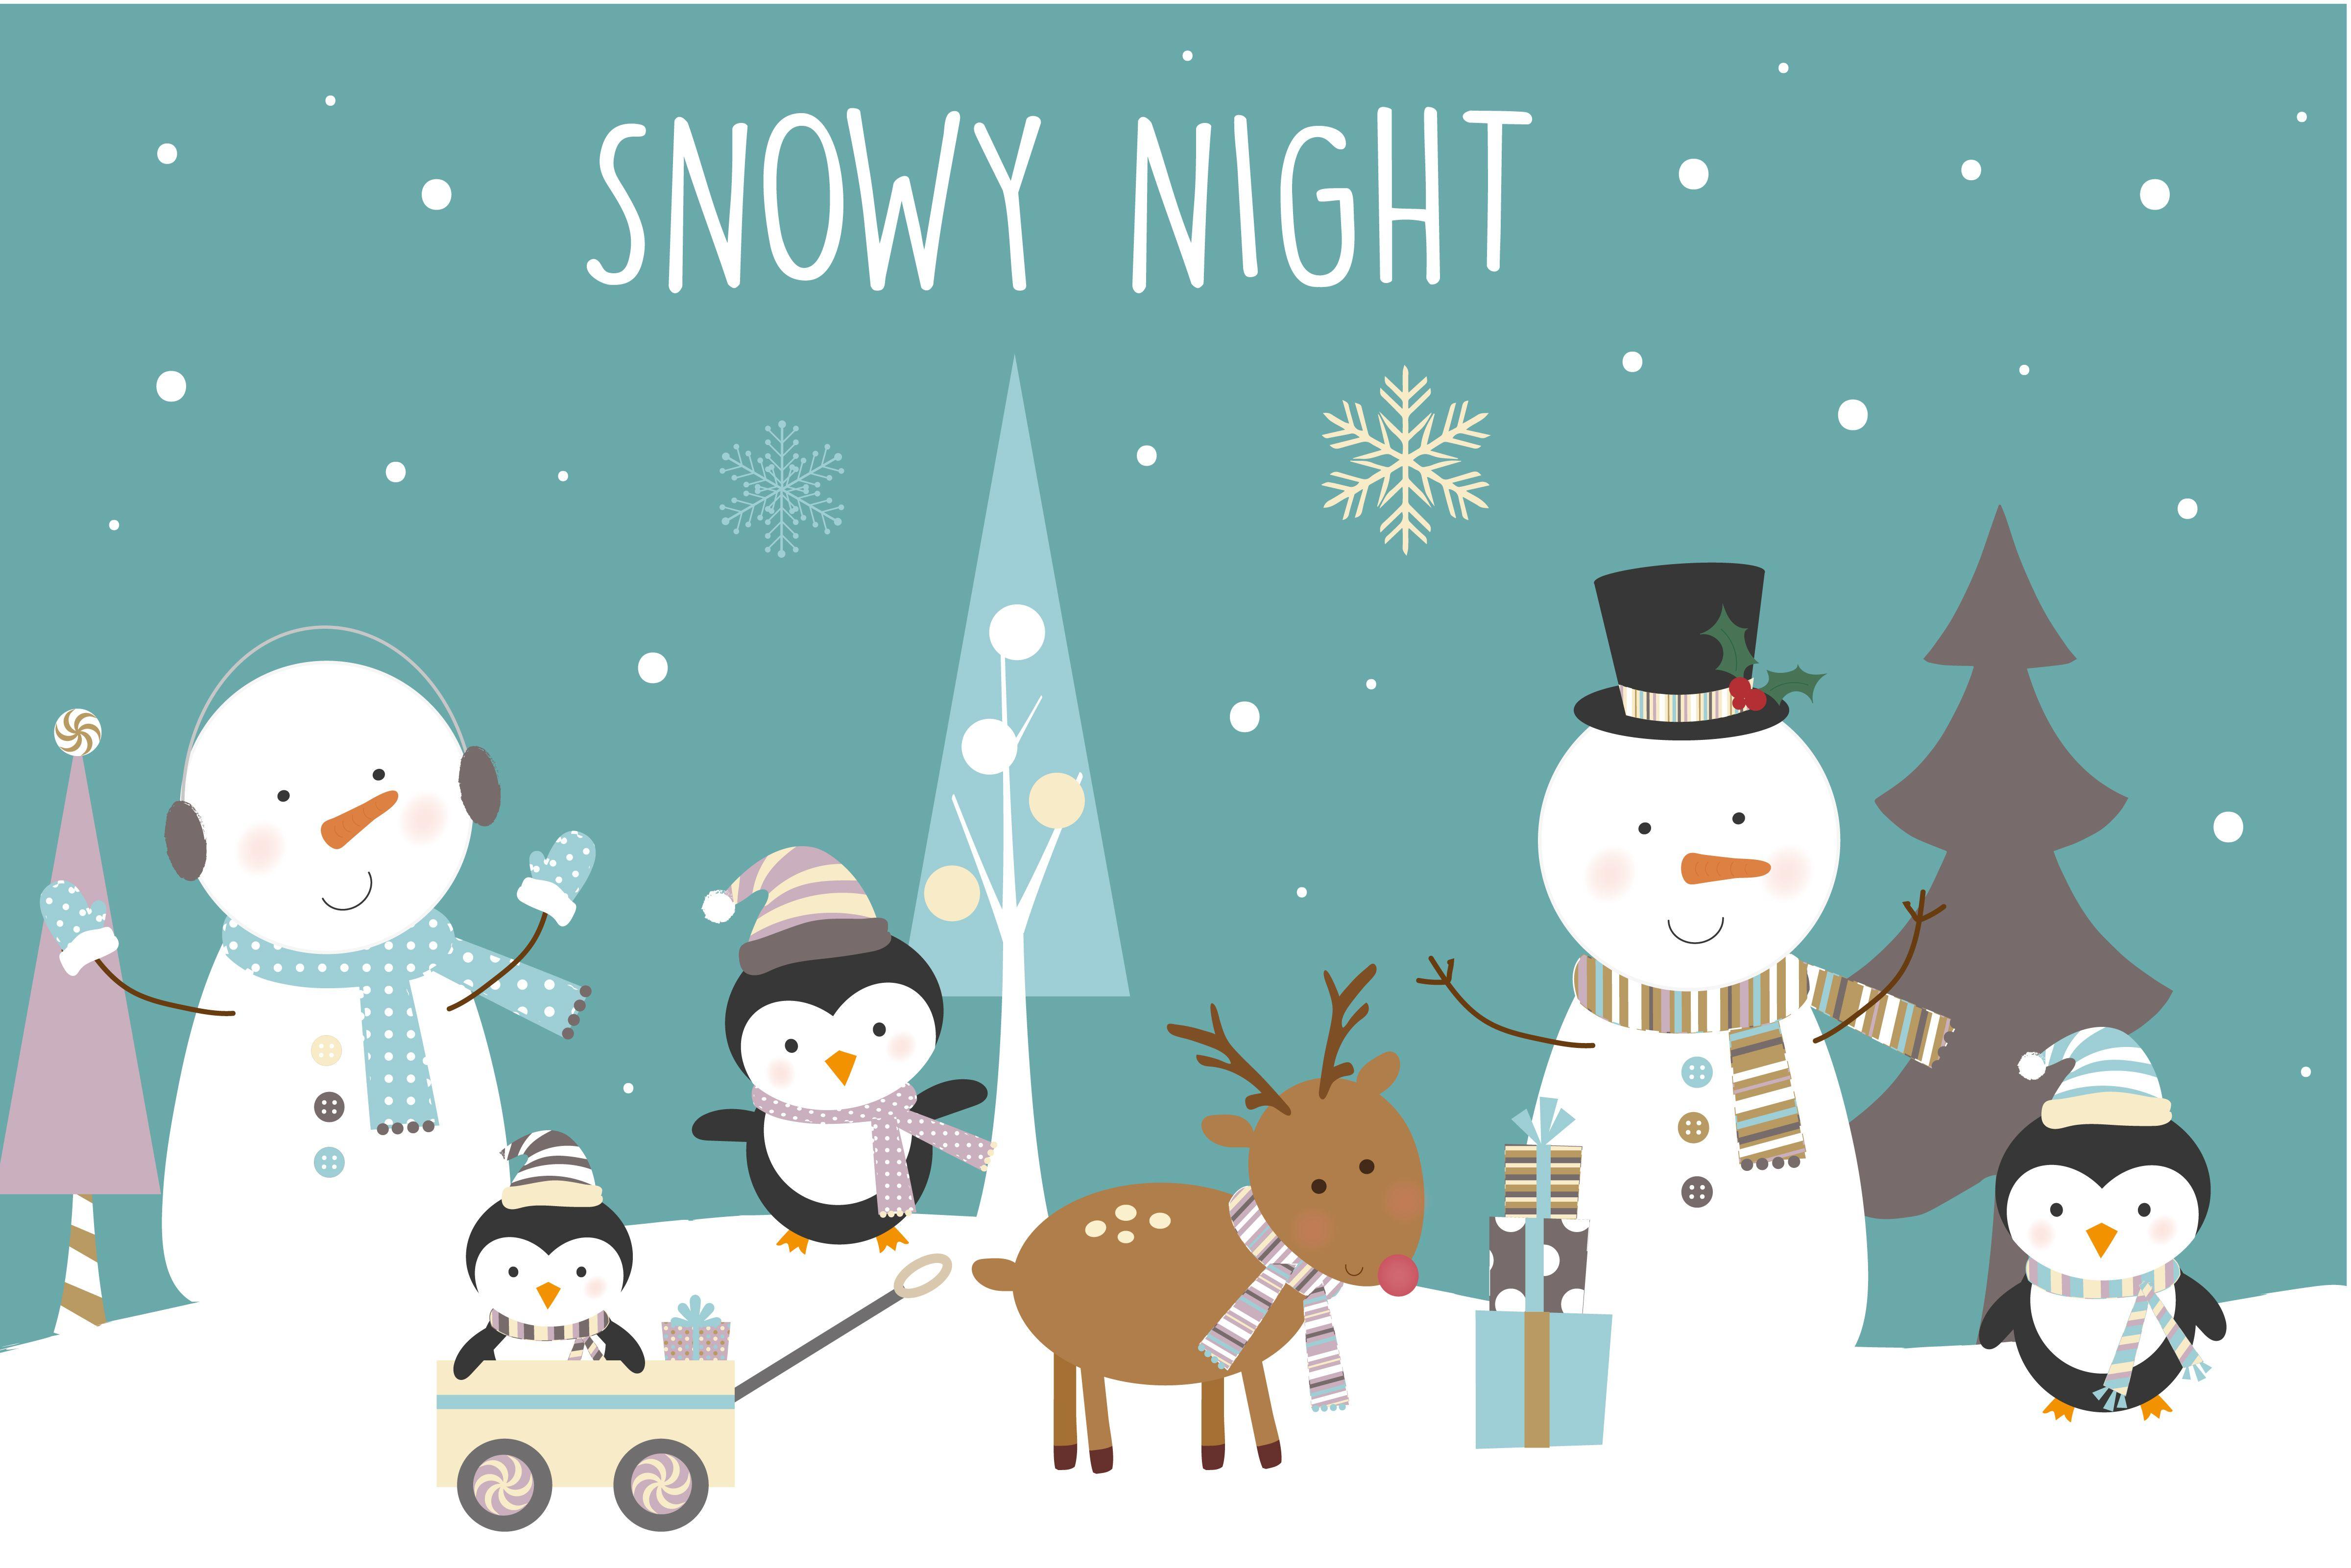 Winter clipart snowy. Night design illustrations